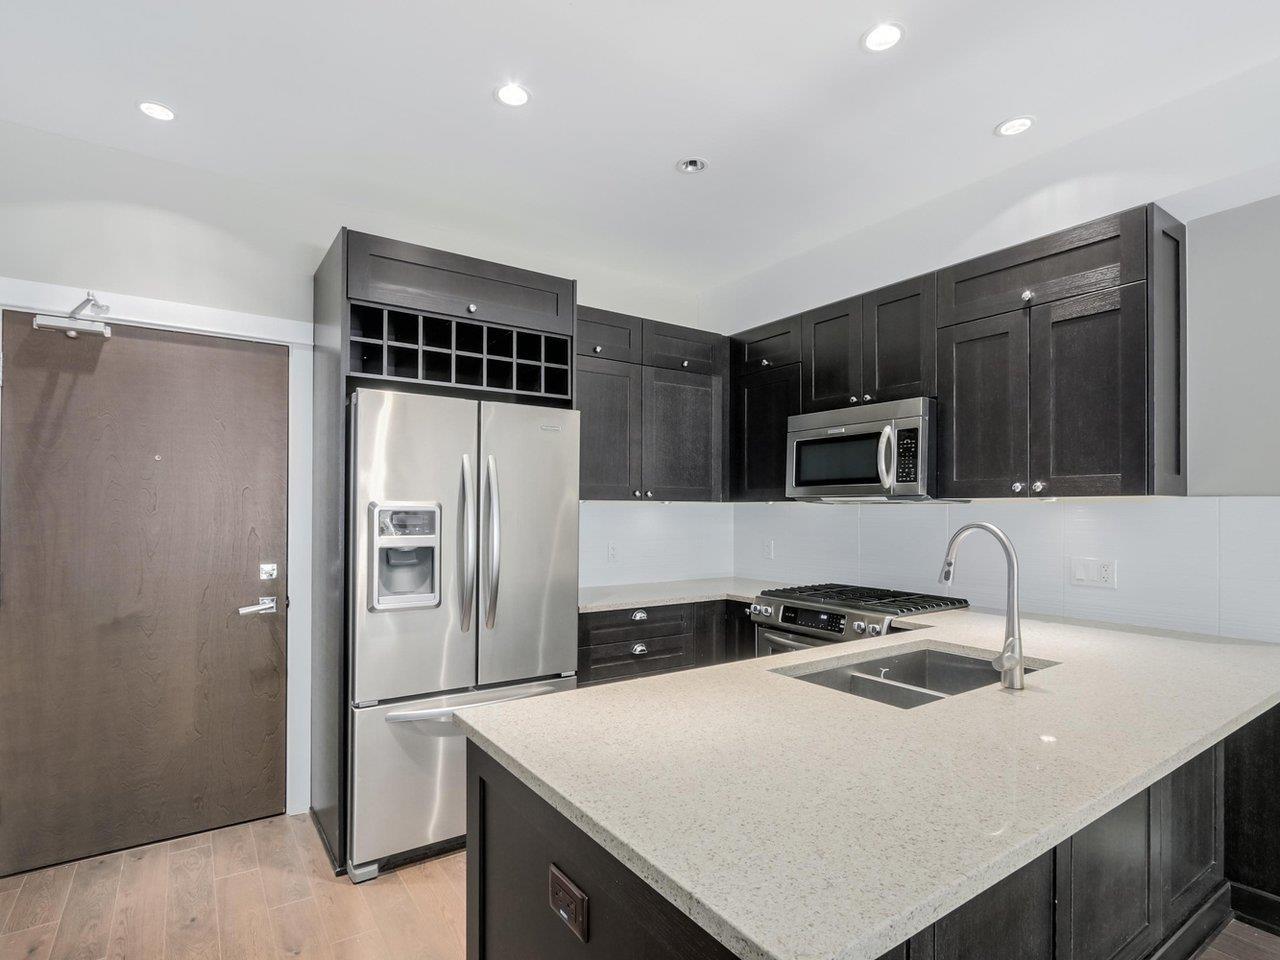 Condo Apartment at 206 15185 36 AVENUE, Unit 206, South Surrey White Rock, British Columbia. Image 5